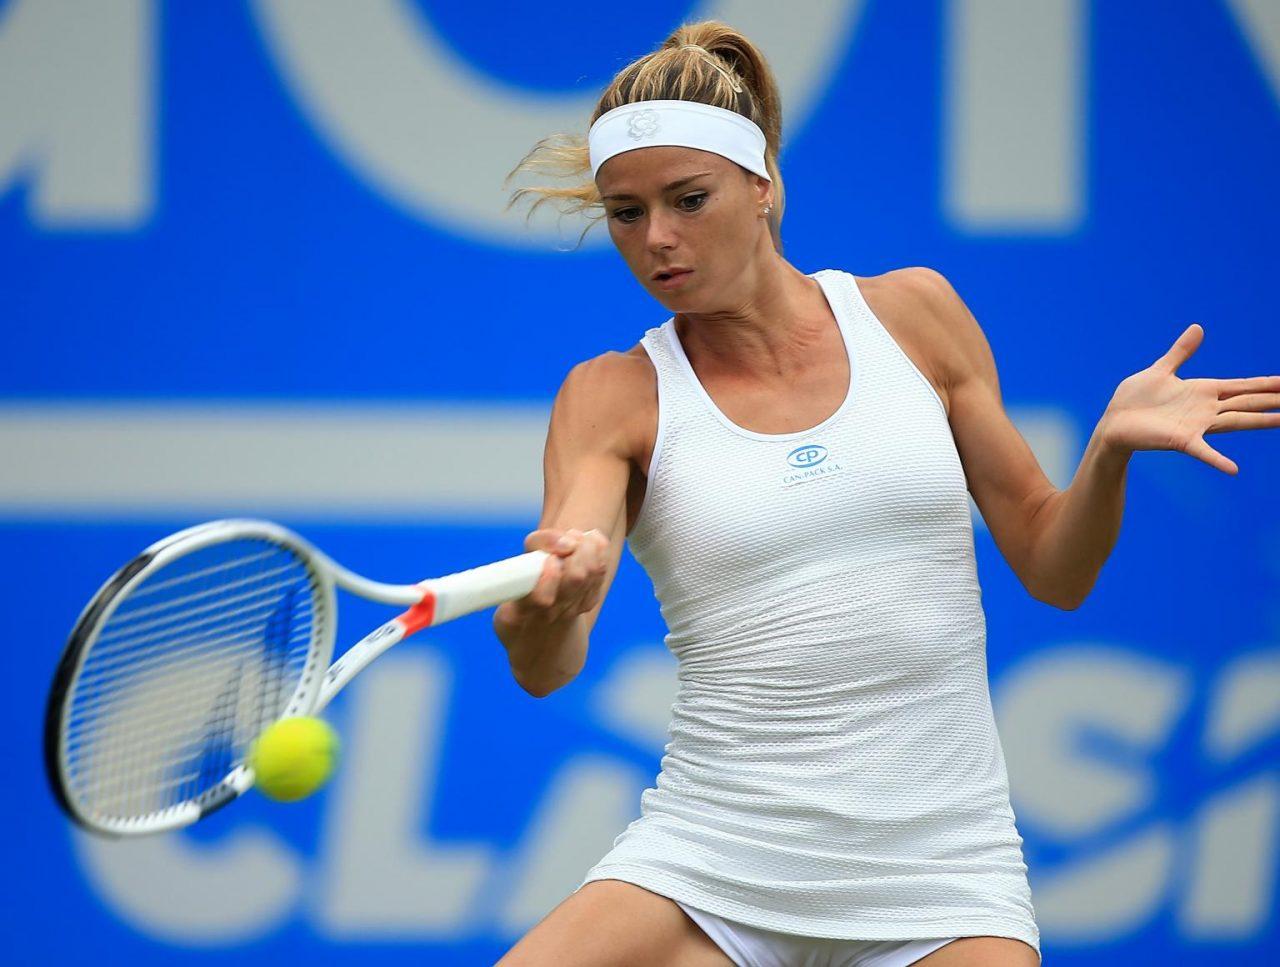 Giorgi tennis scandal betting 2 15 bitcoins value